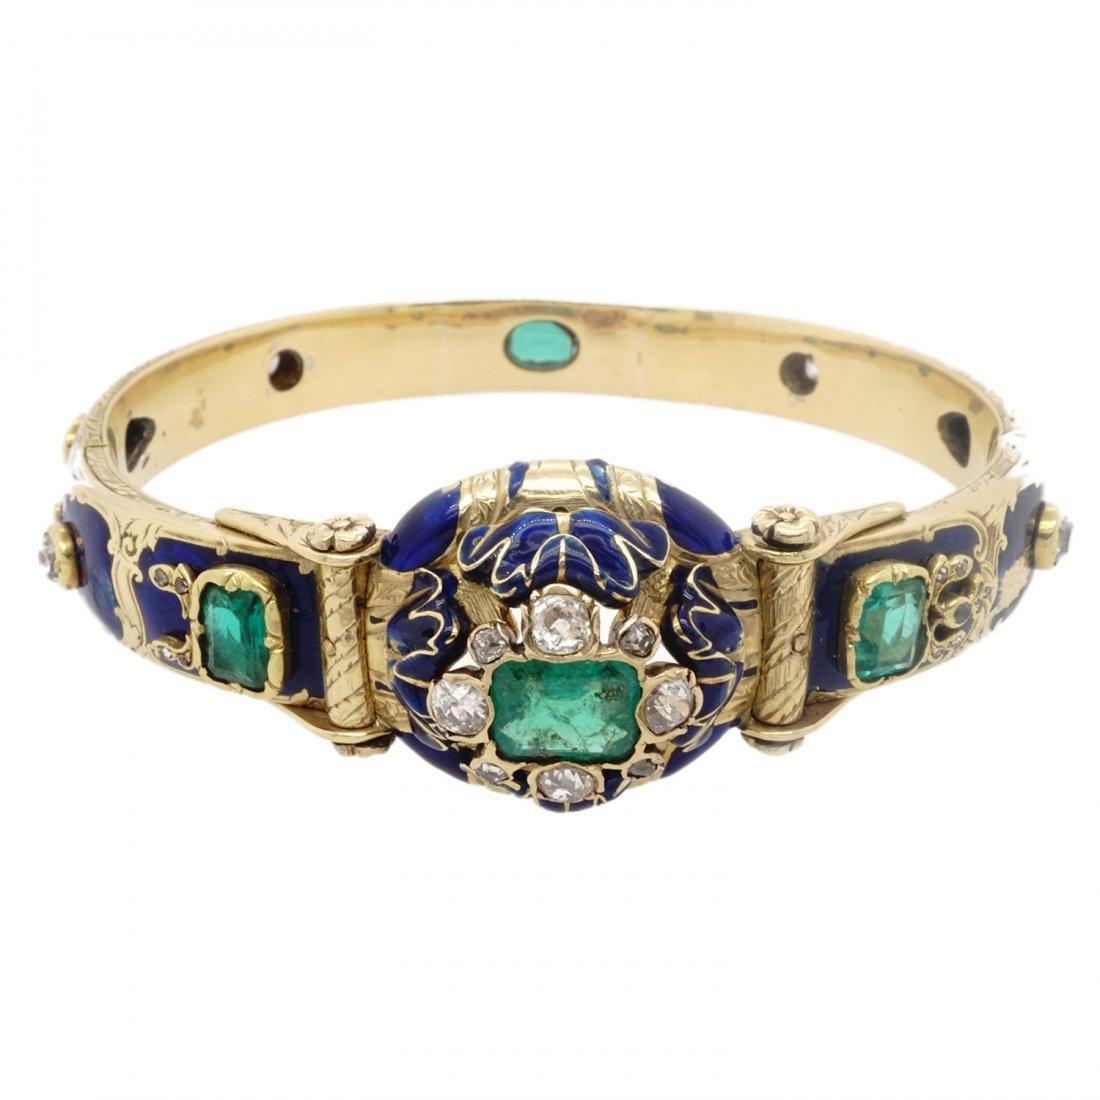 VICTORIAN EMERALD DIAMOND 18 KARAT GOLD ENAMEL BANGLE